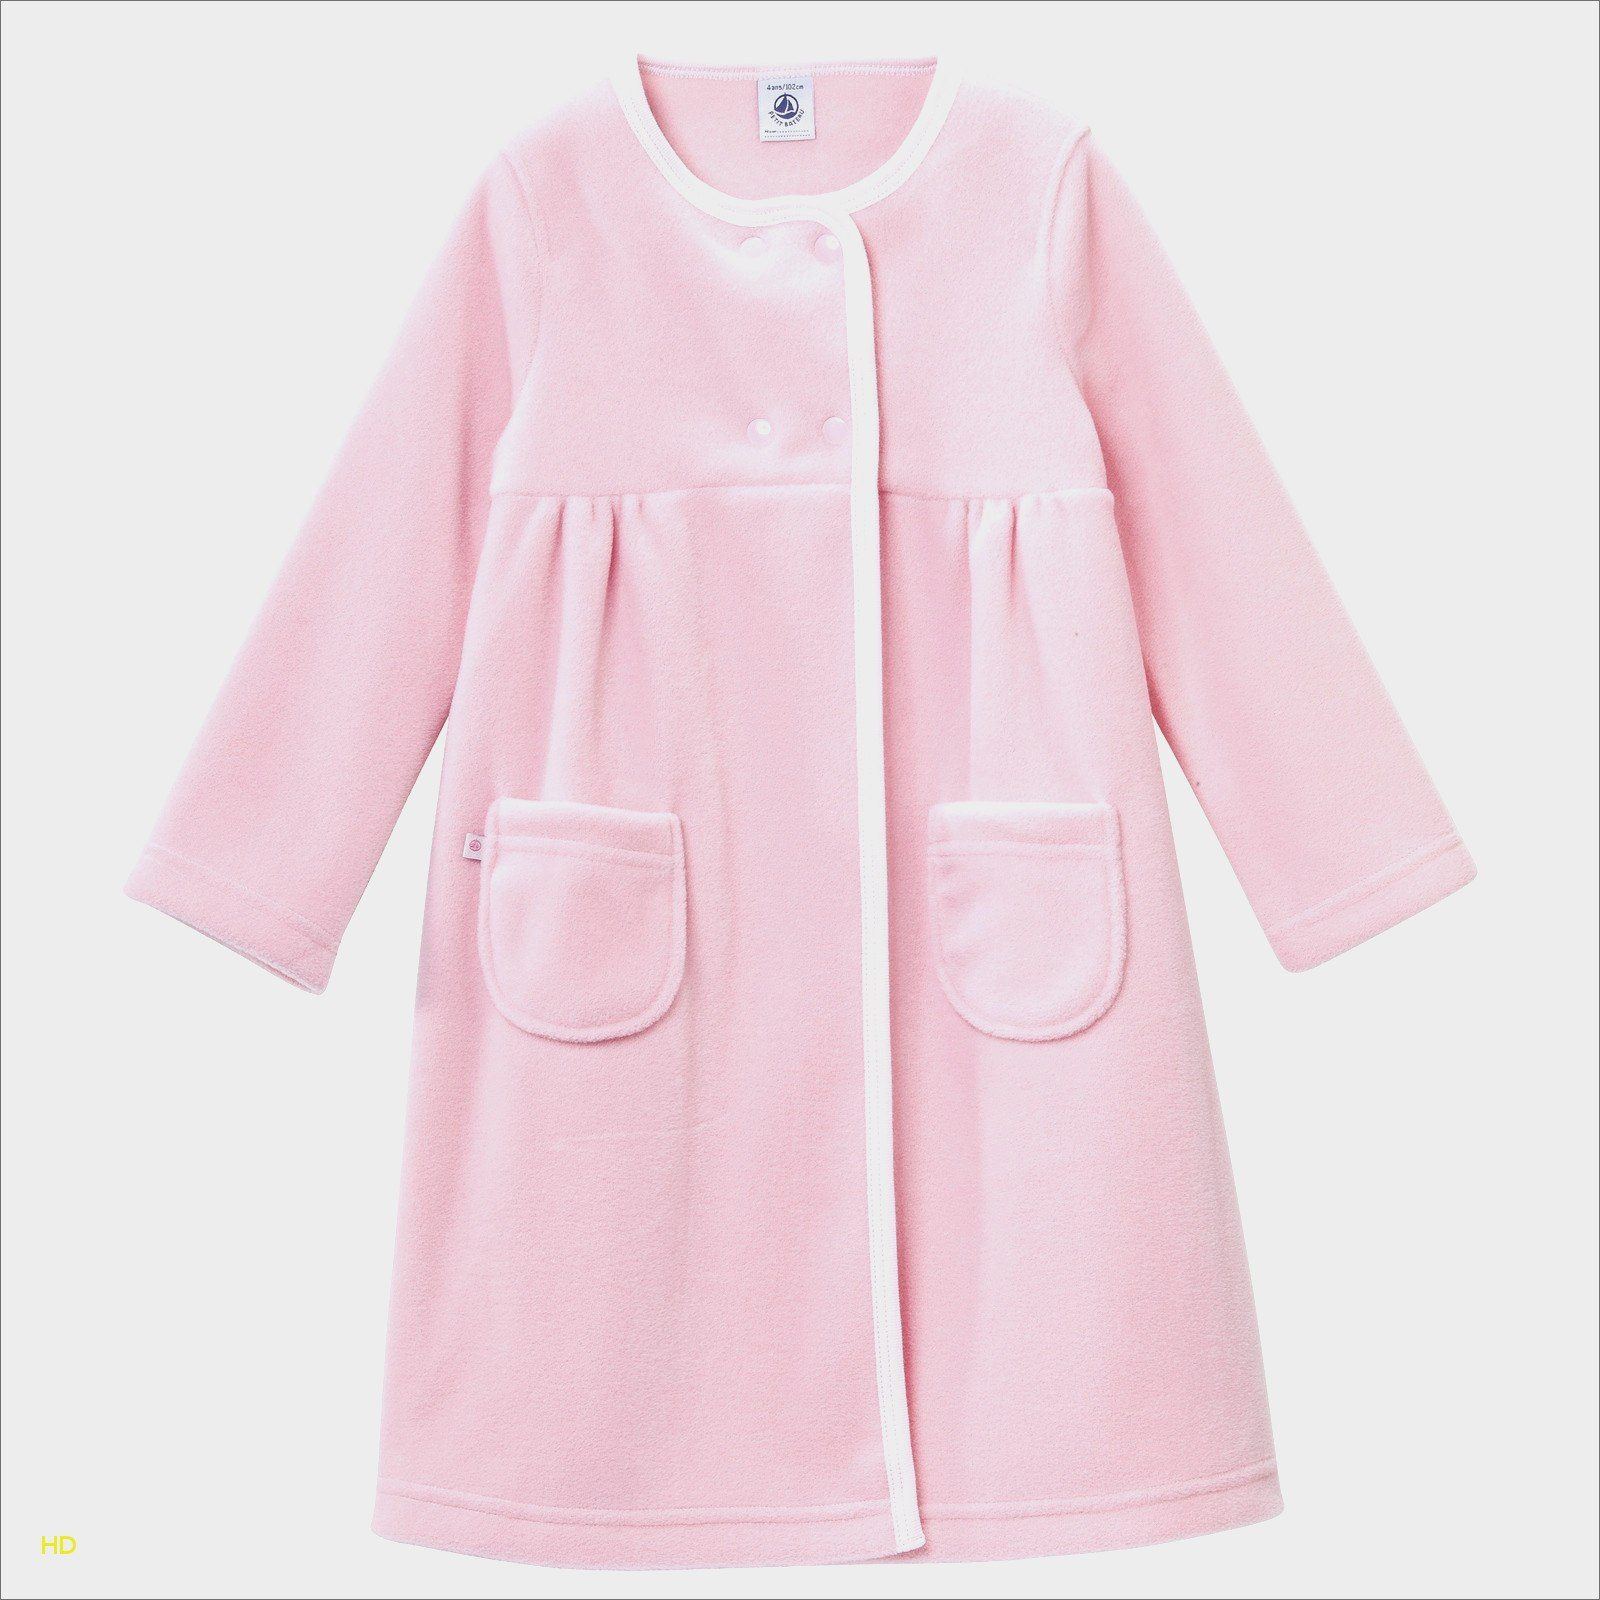 Lit Bebe Luxe Inspirant Attrayant Robe Chambre Enfant Sur Robe De Chambre Ado Luxe Chambre